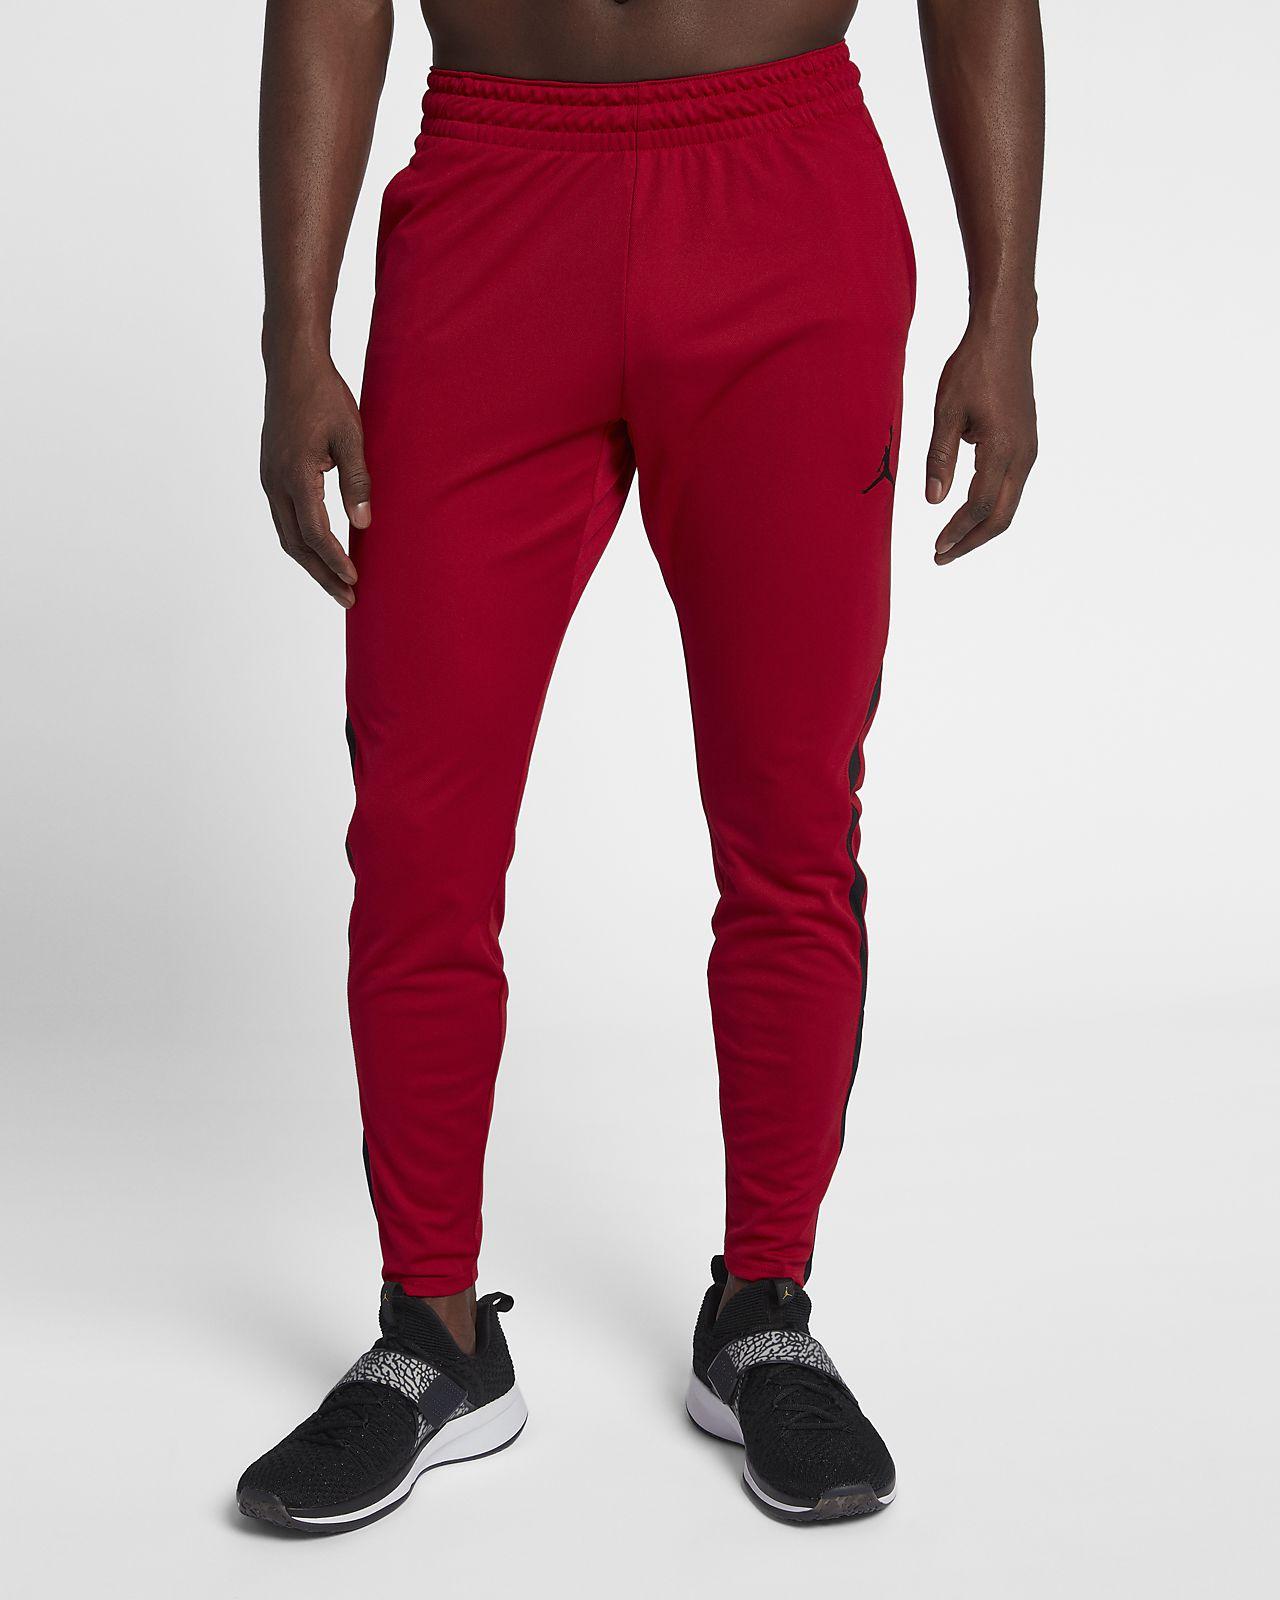 Jordan Dri-FIT 23 Alpha Pantalón de baloncesto - Hombre